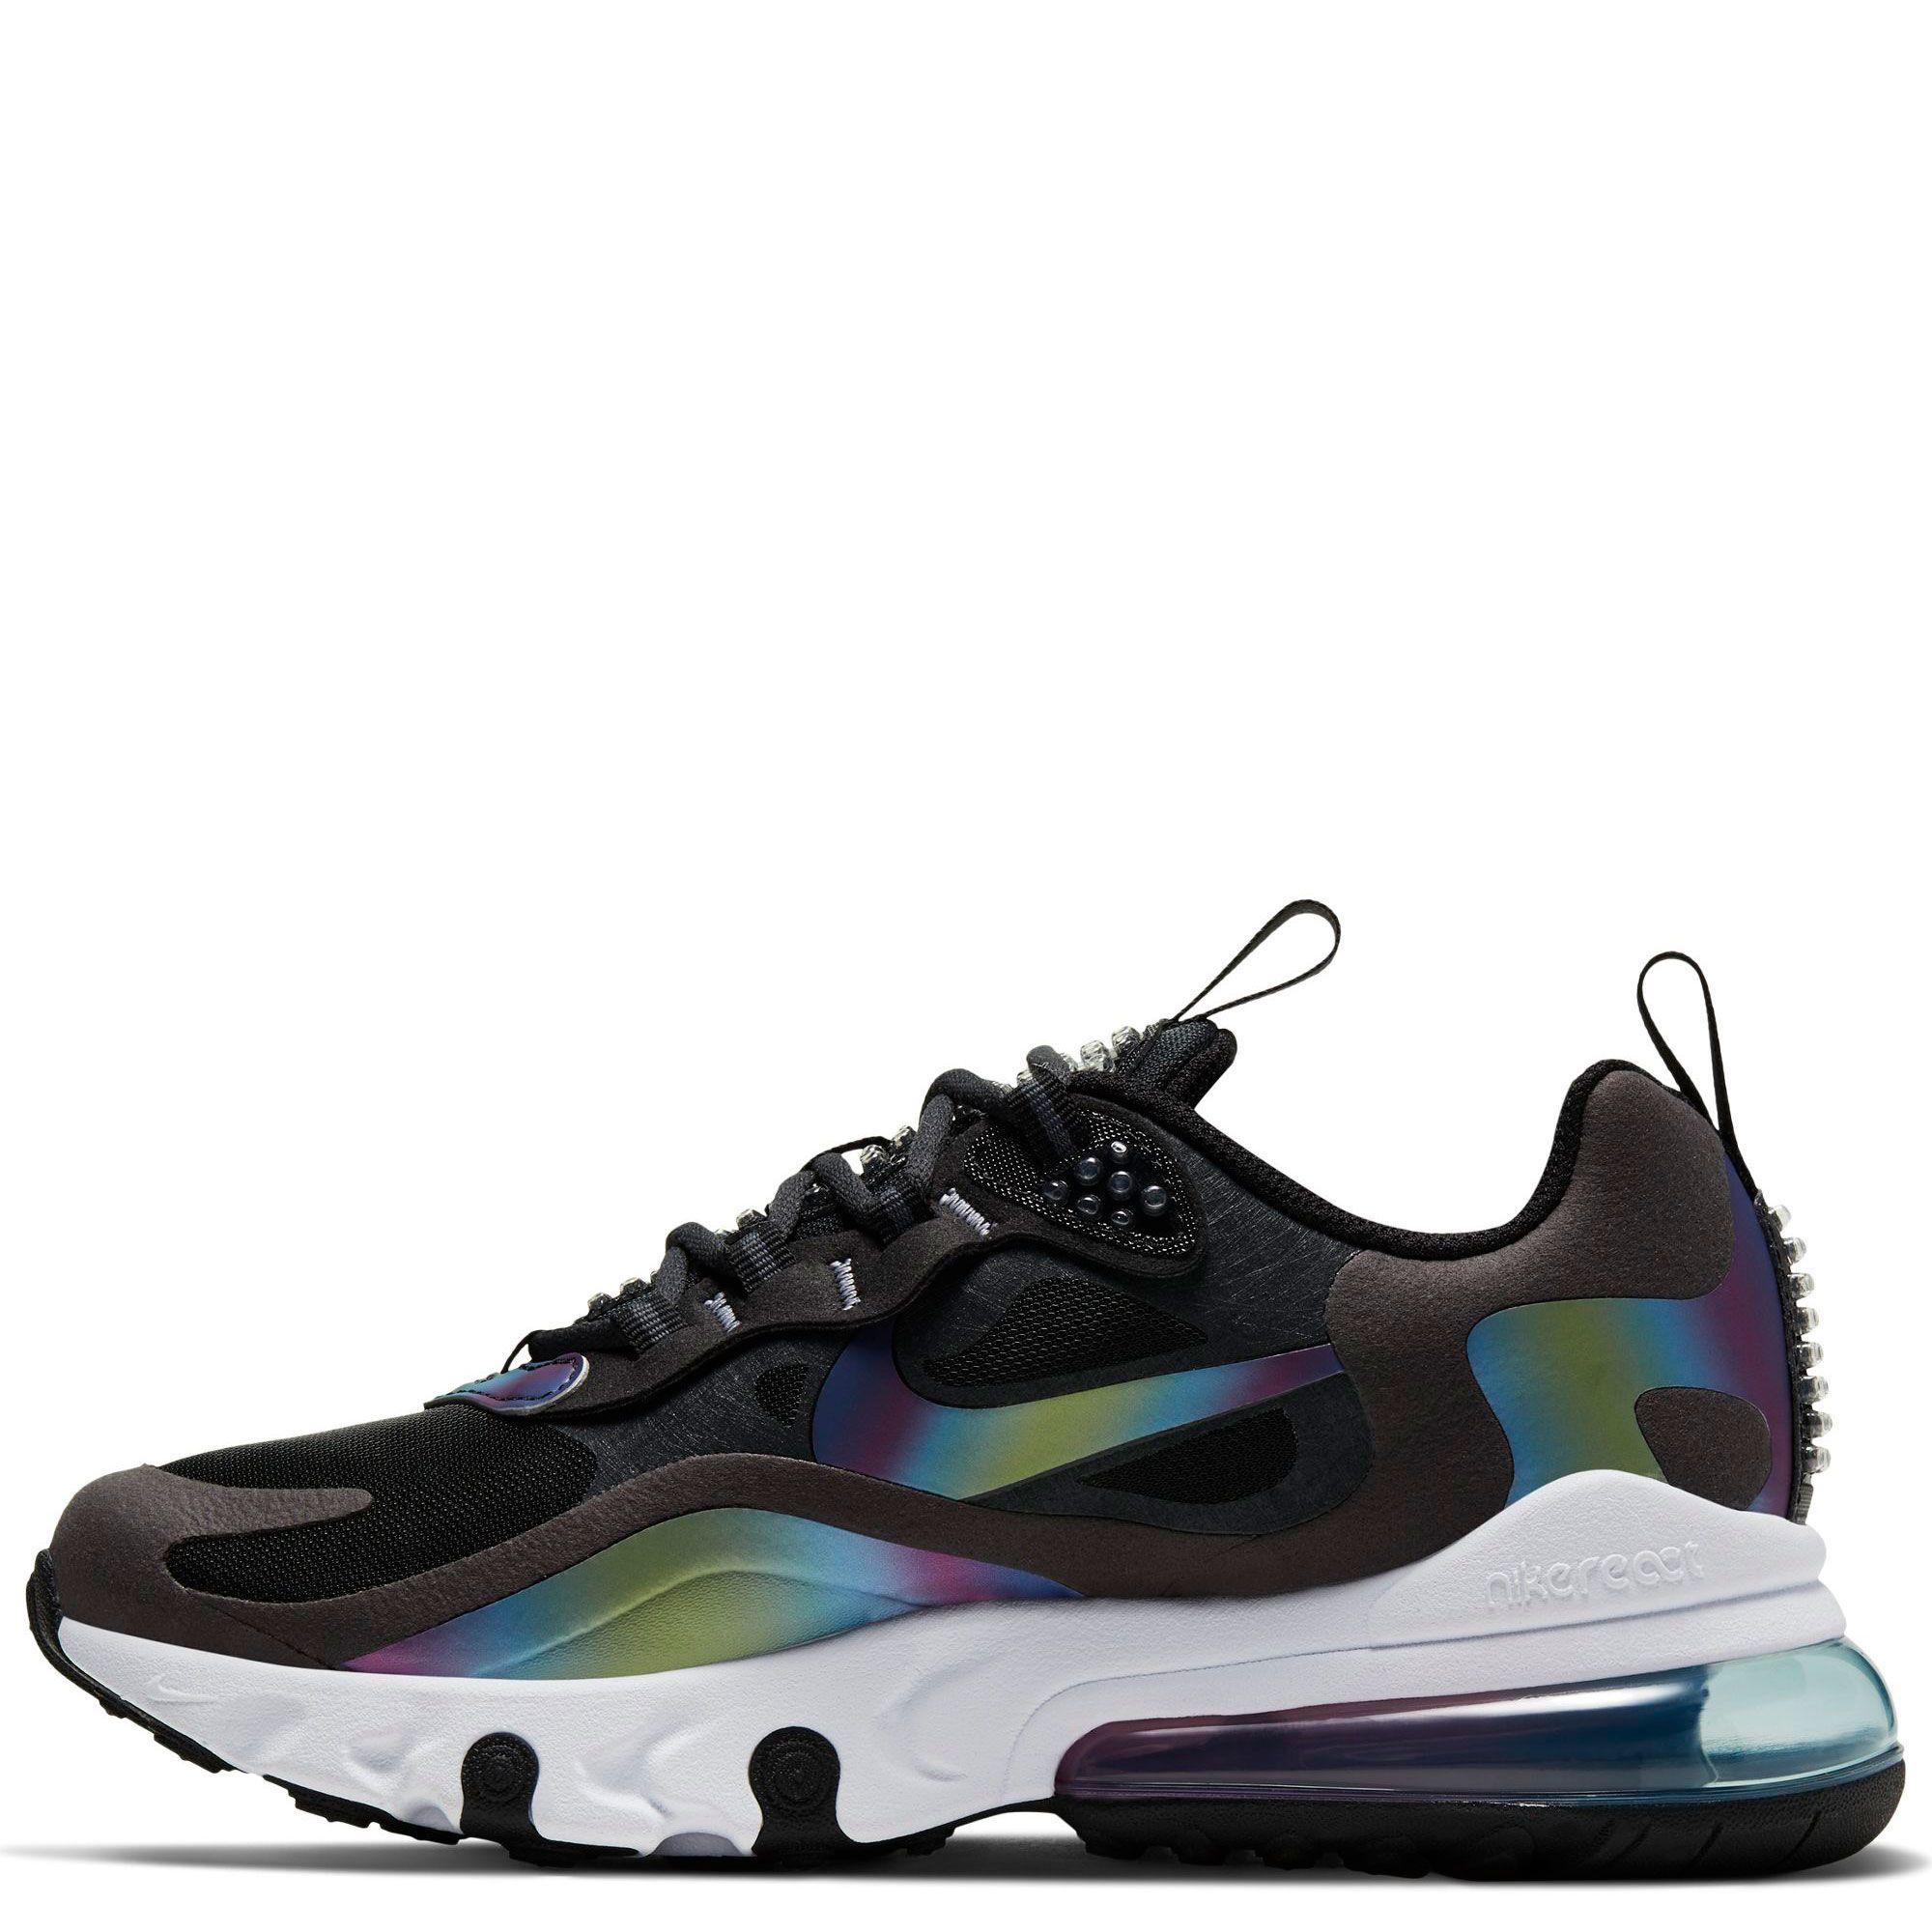 air max 270 color